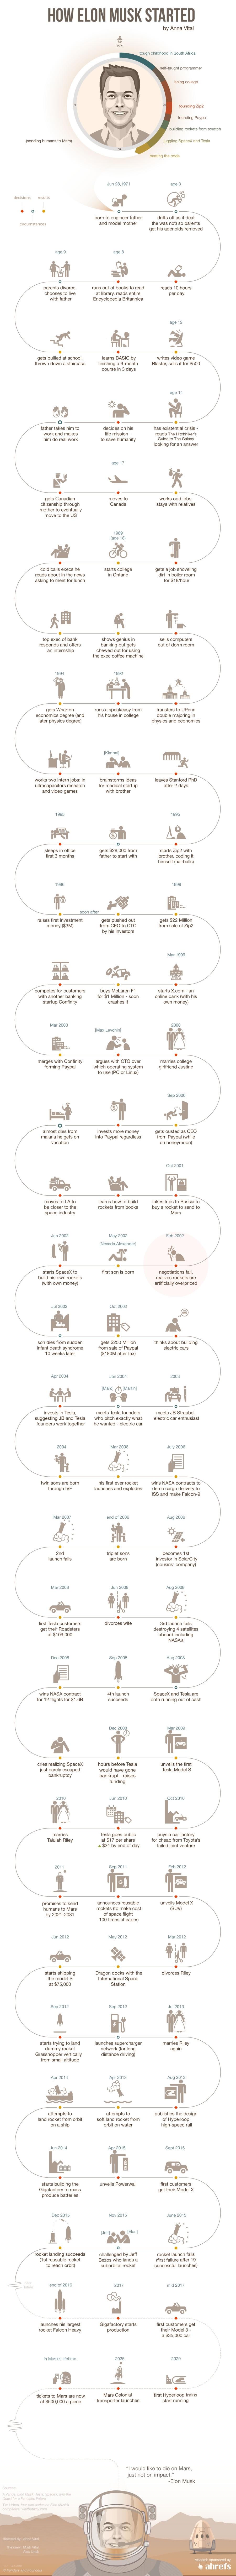 Infographic elon musk